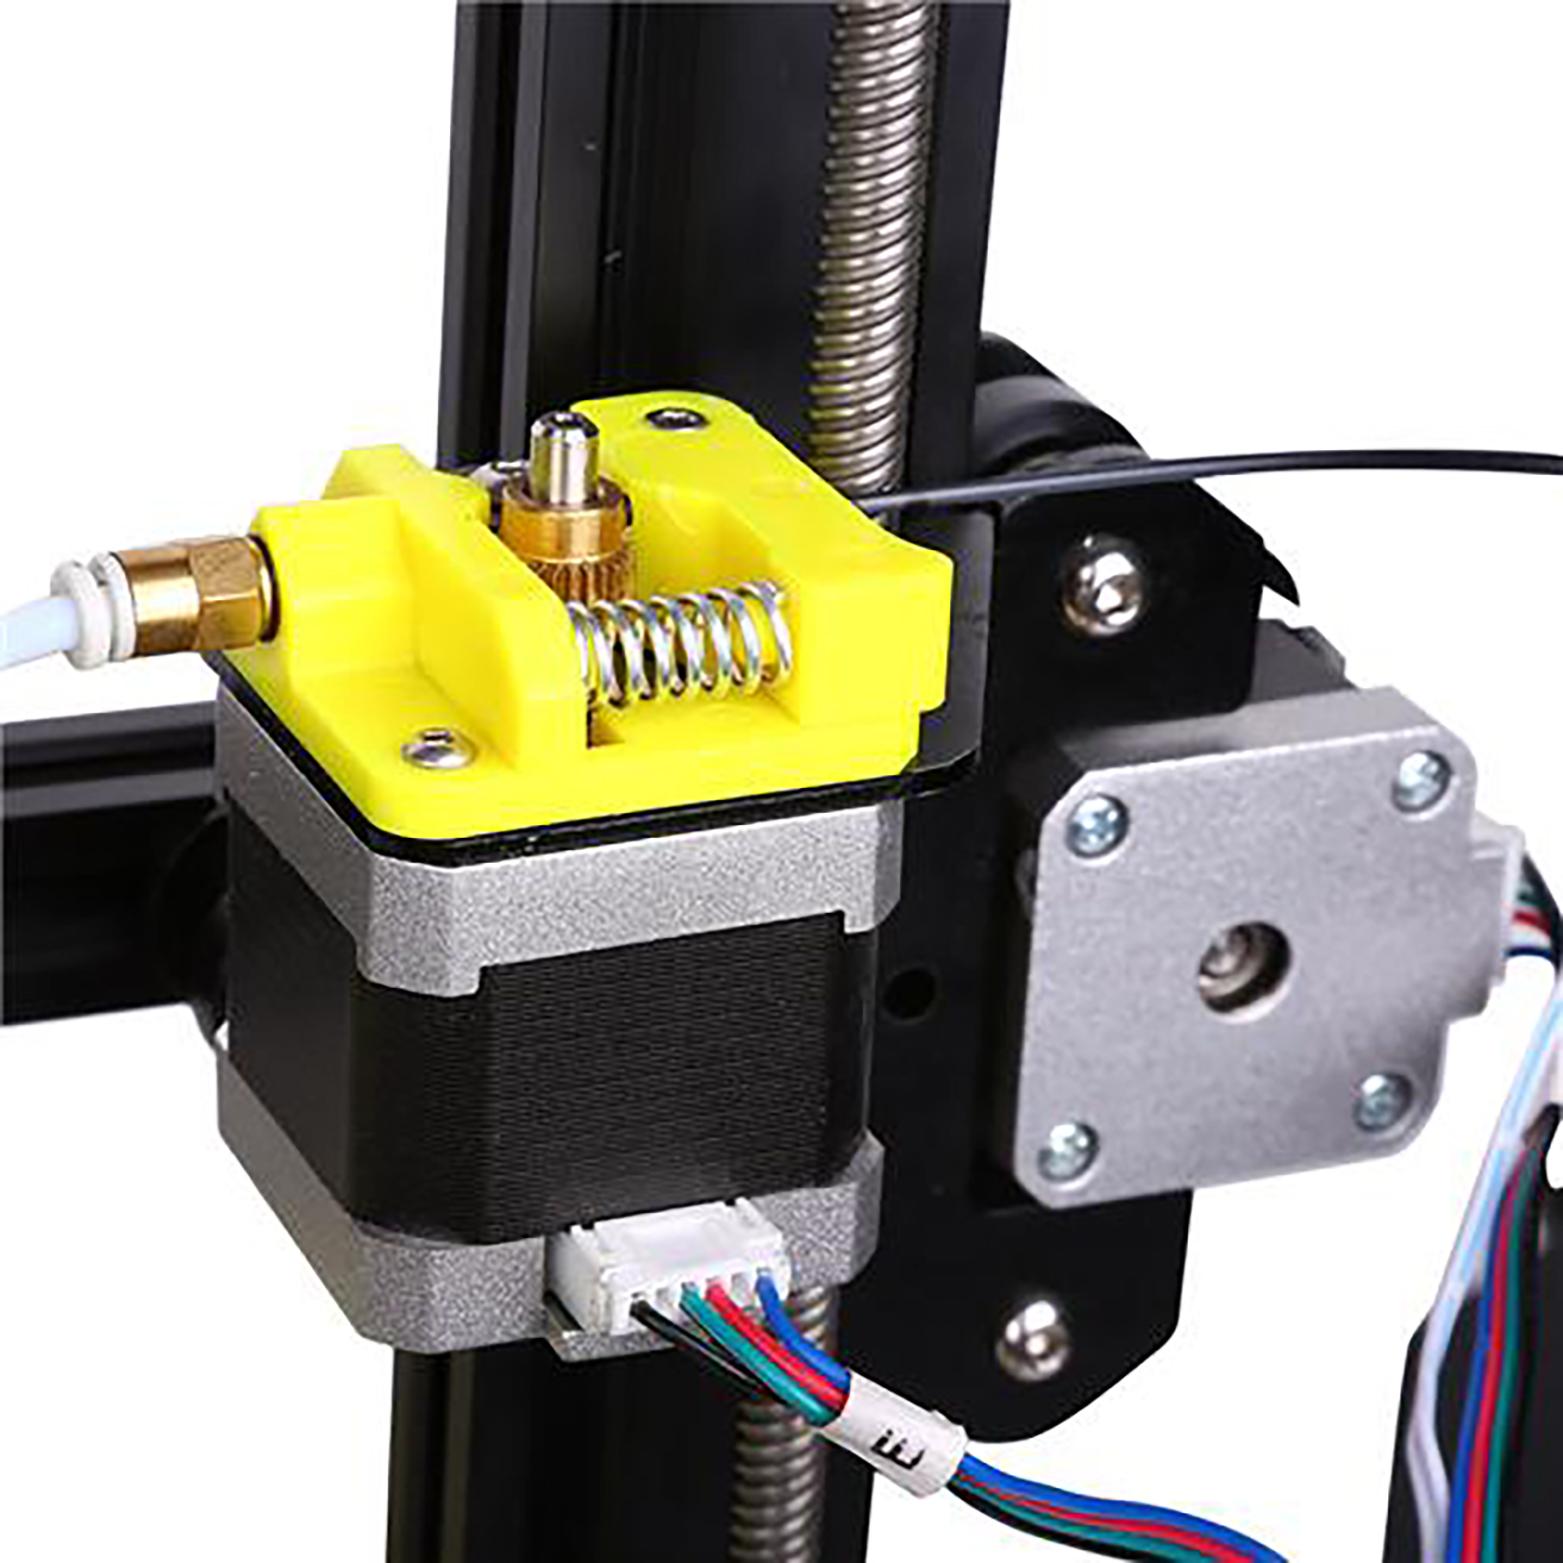 Creation Reality 3D Printer CR-10 Series NEMA17 Extruder Motor  JK42HS40-1004A-02F